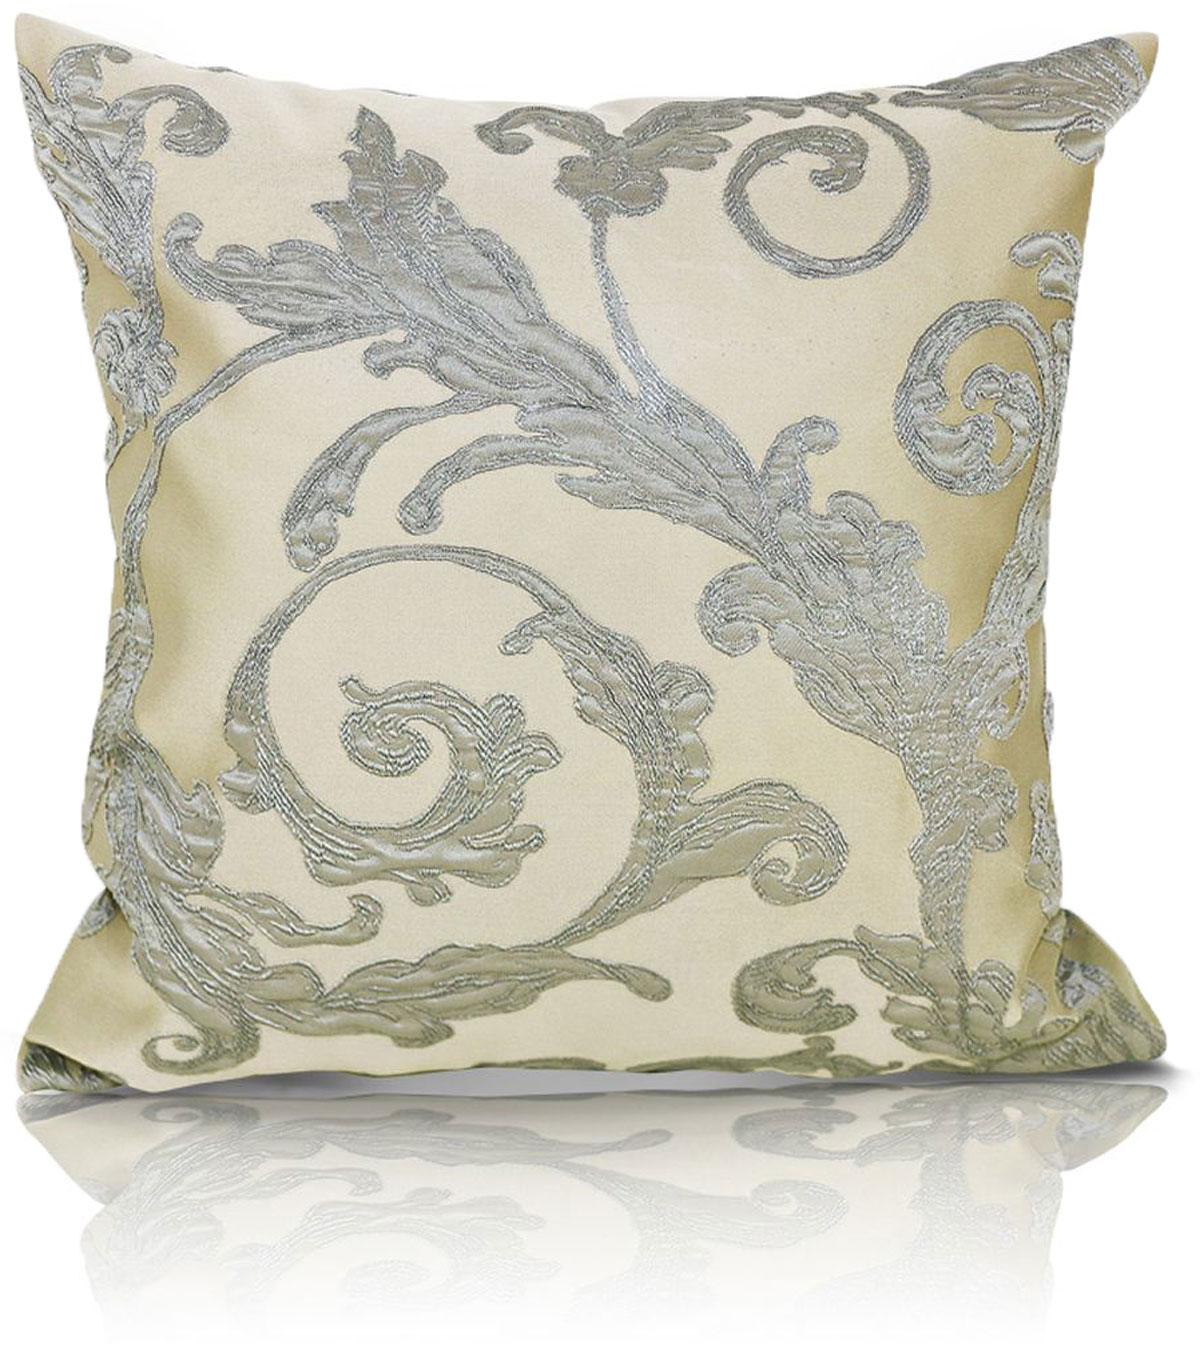 Подушка декоративная KauffOrt Виона, цвет: бежевый, 40 x 40 см подушка декоративная kauffort мауритани цвет бежевый 40 x 40 см